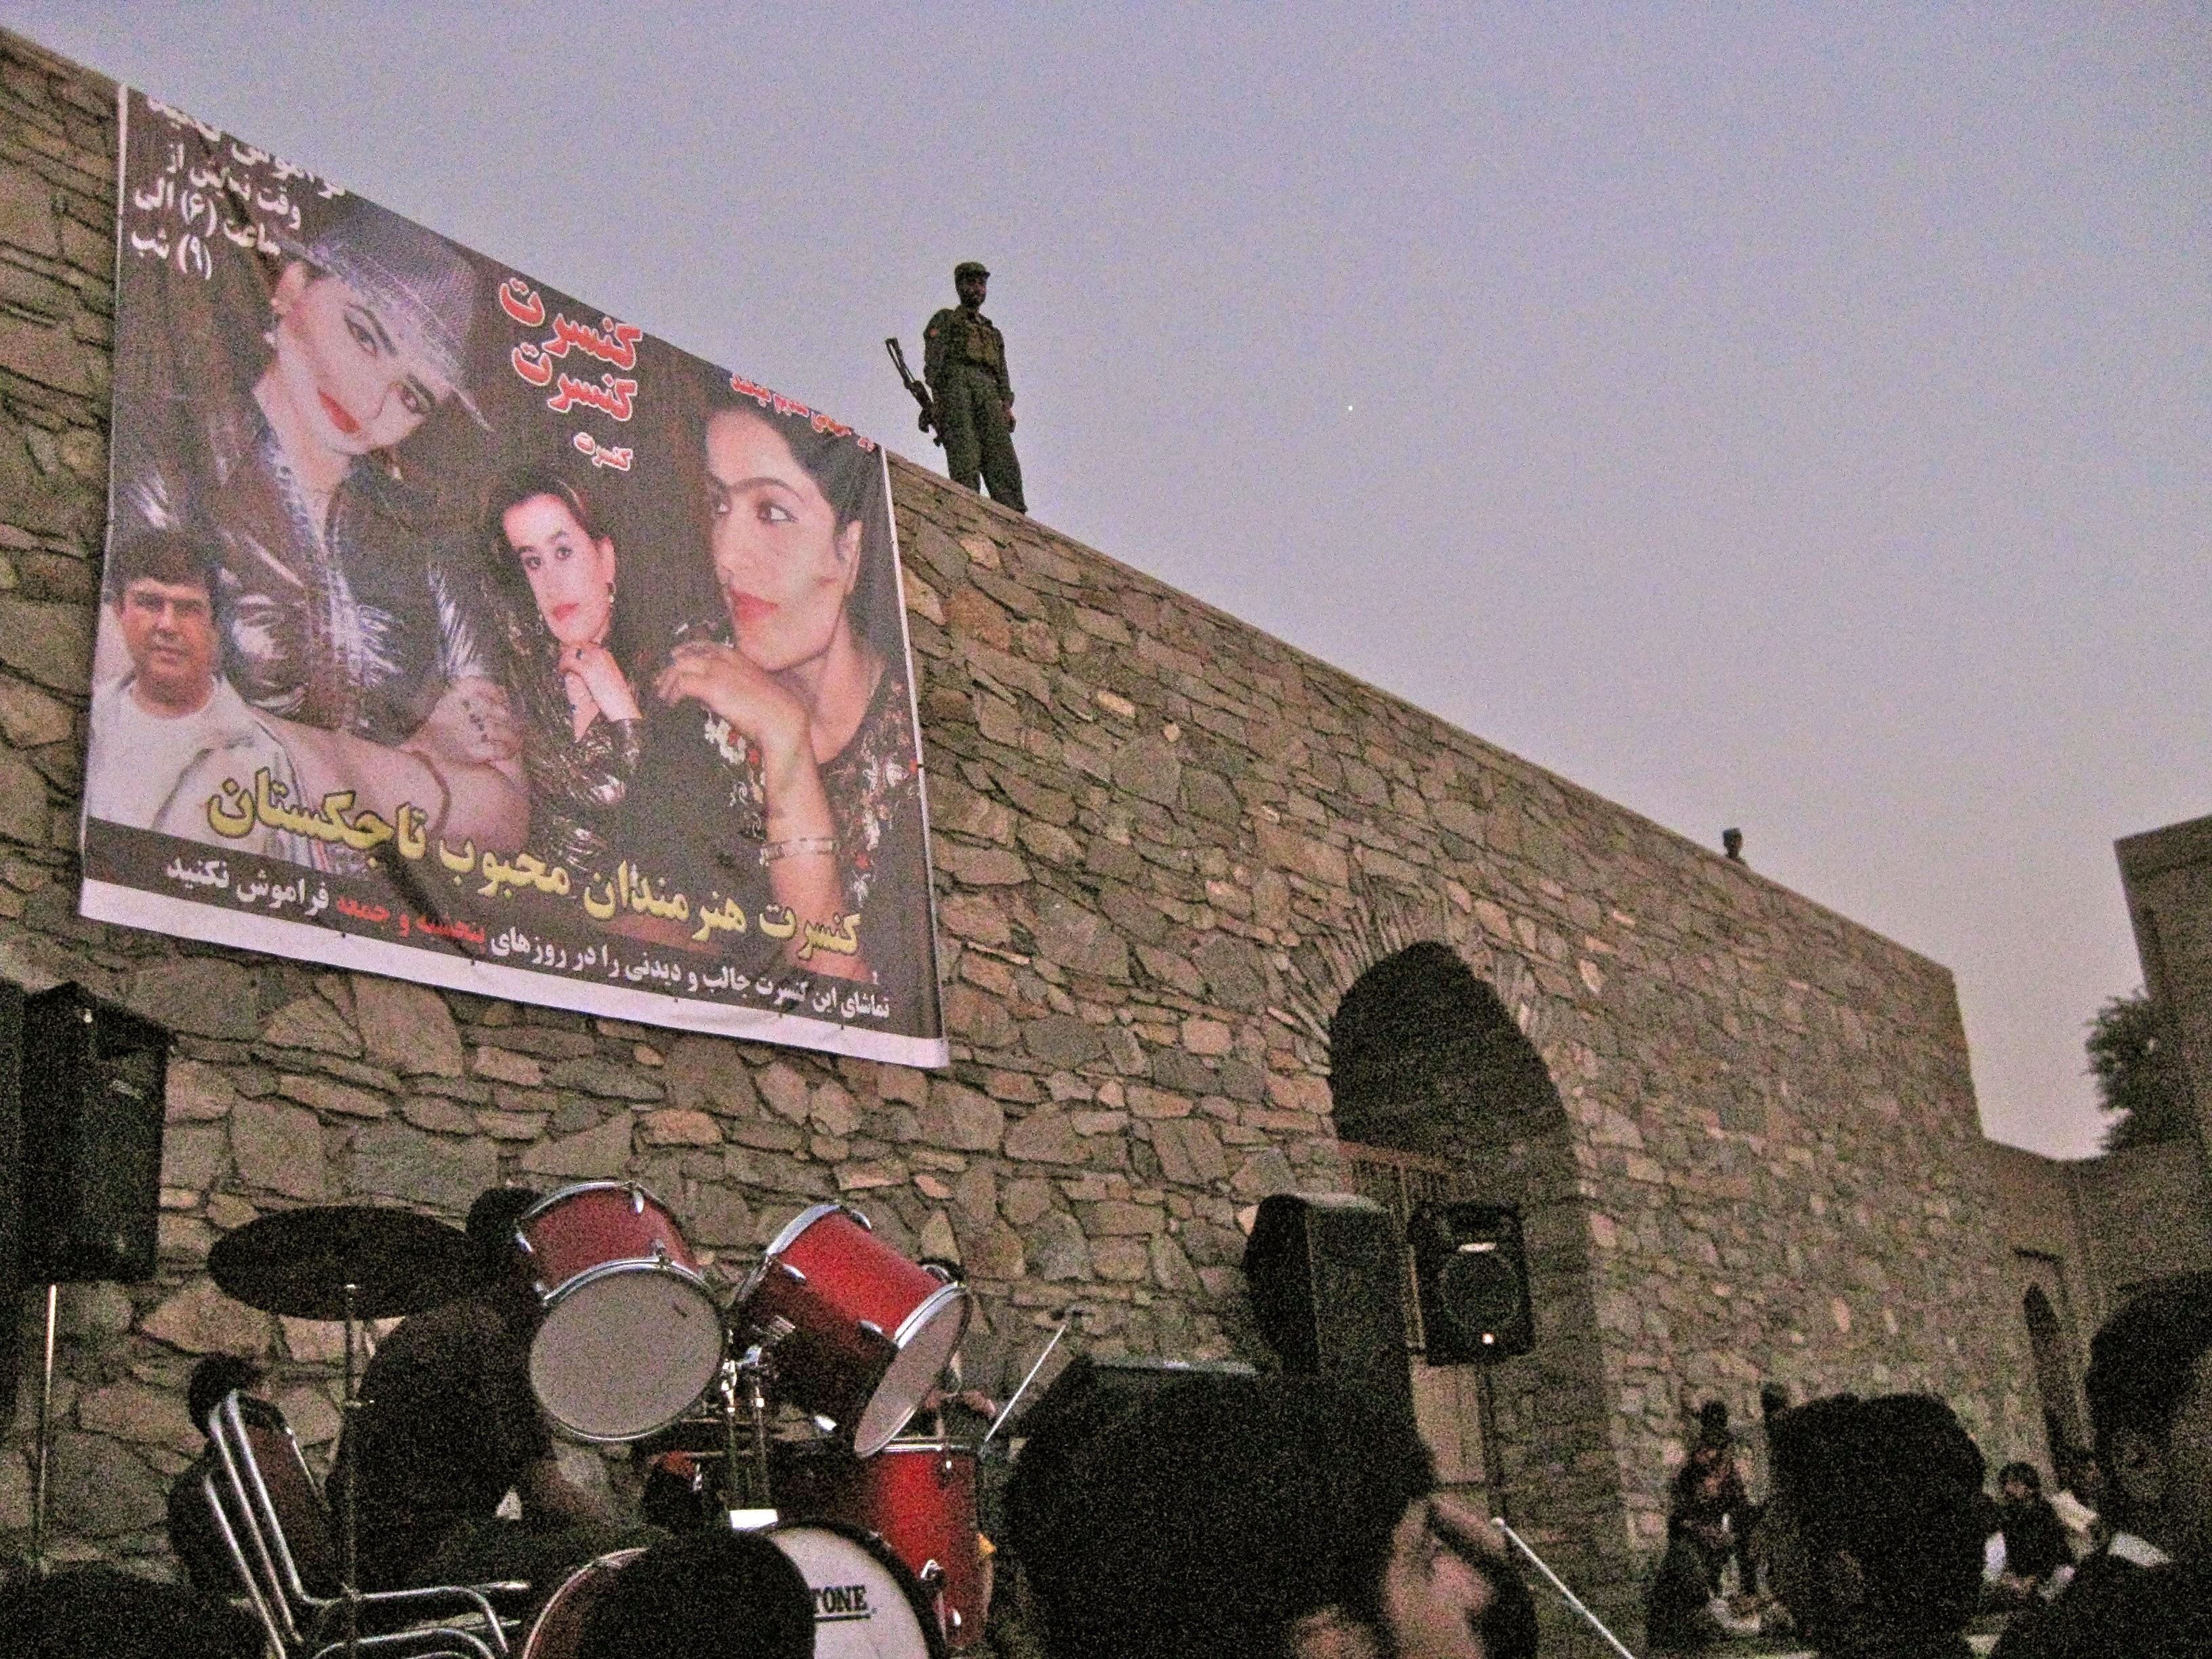 Tajik women concert banner with guard on wall